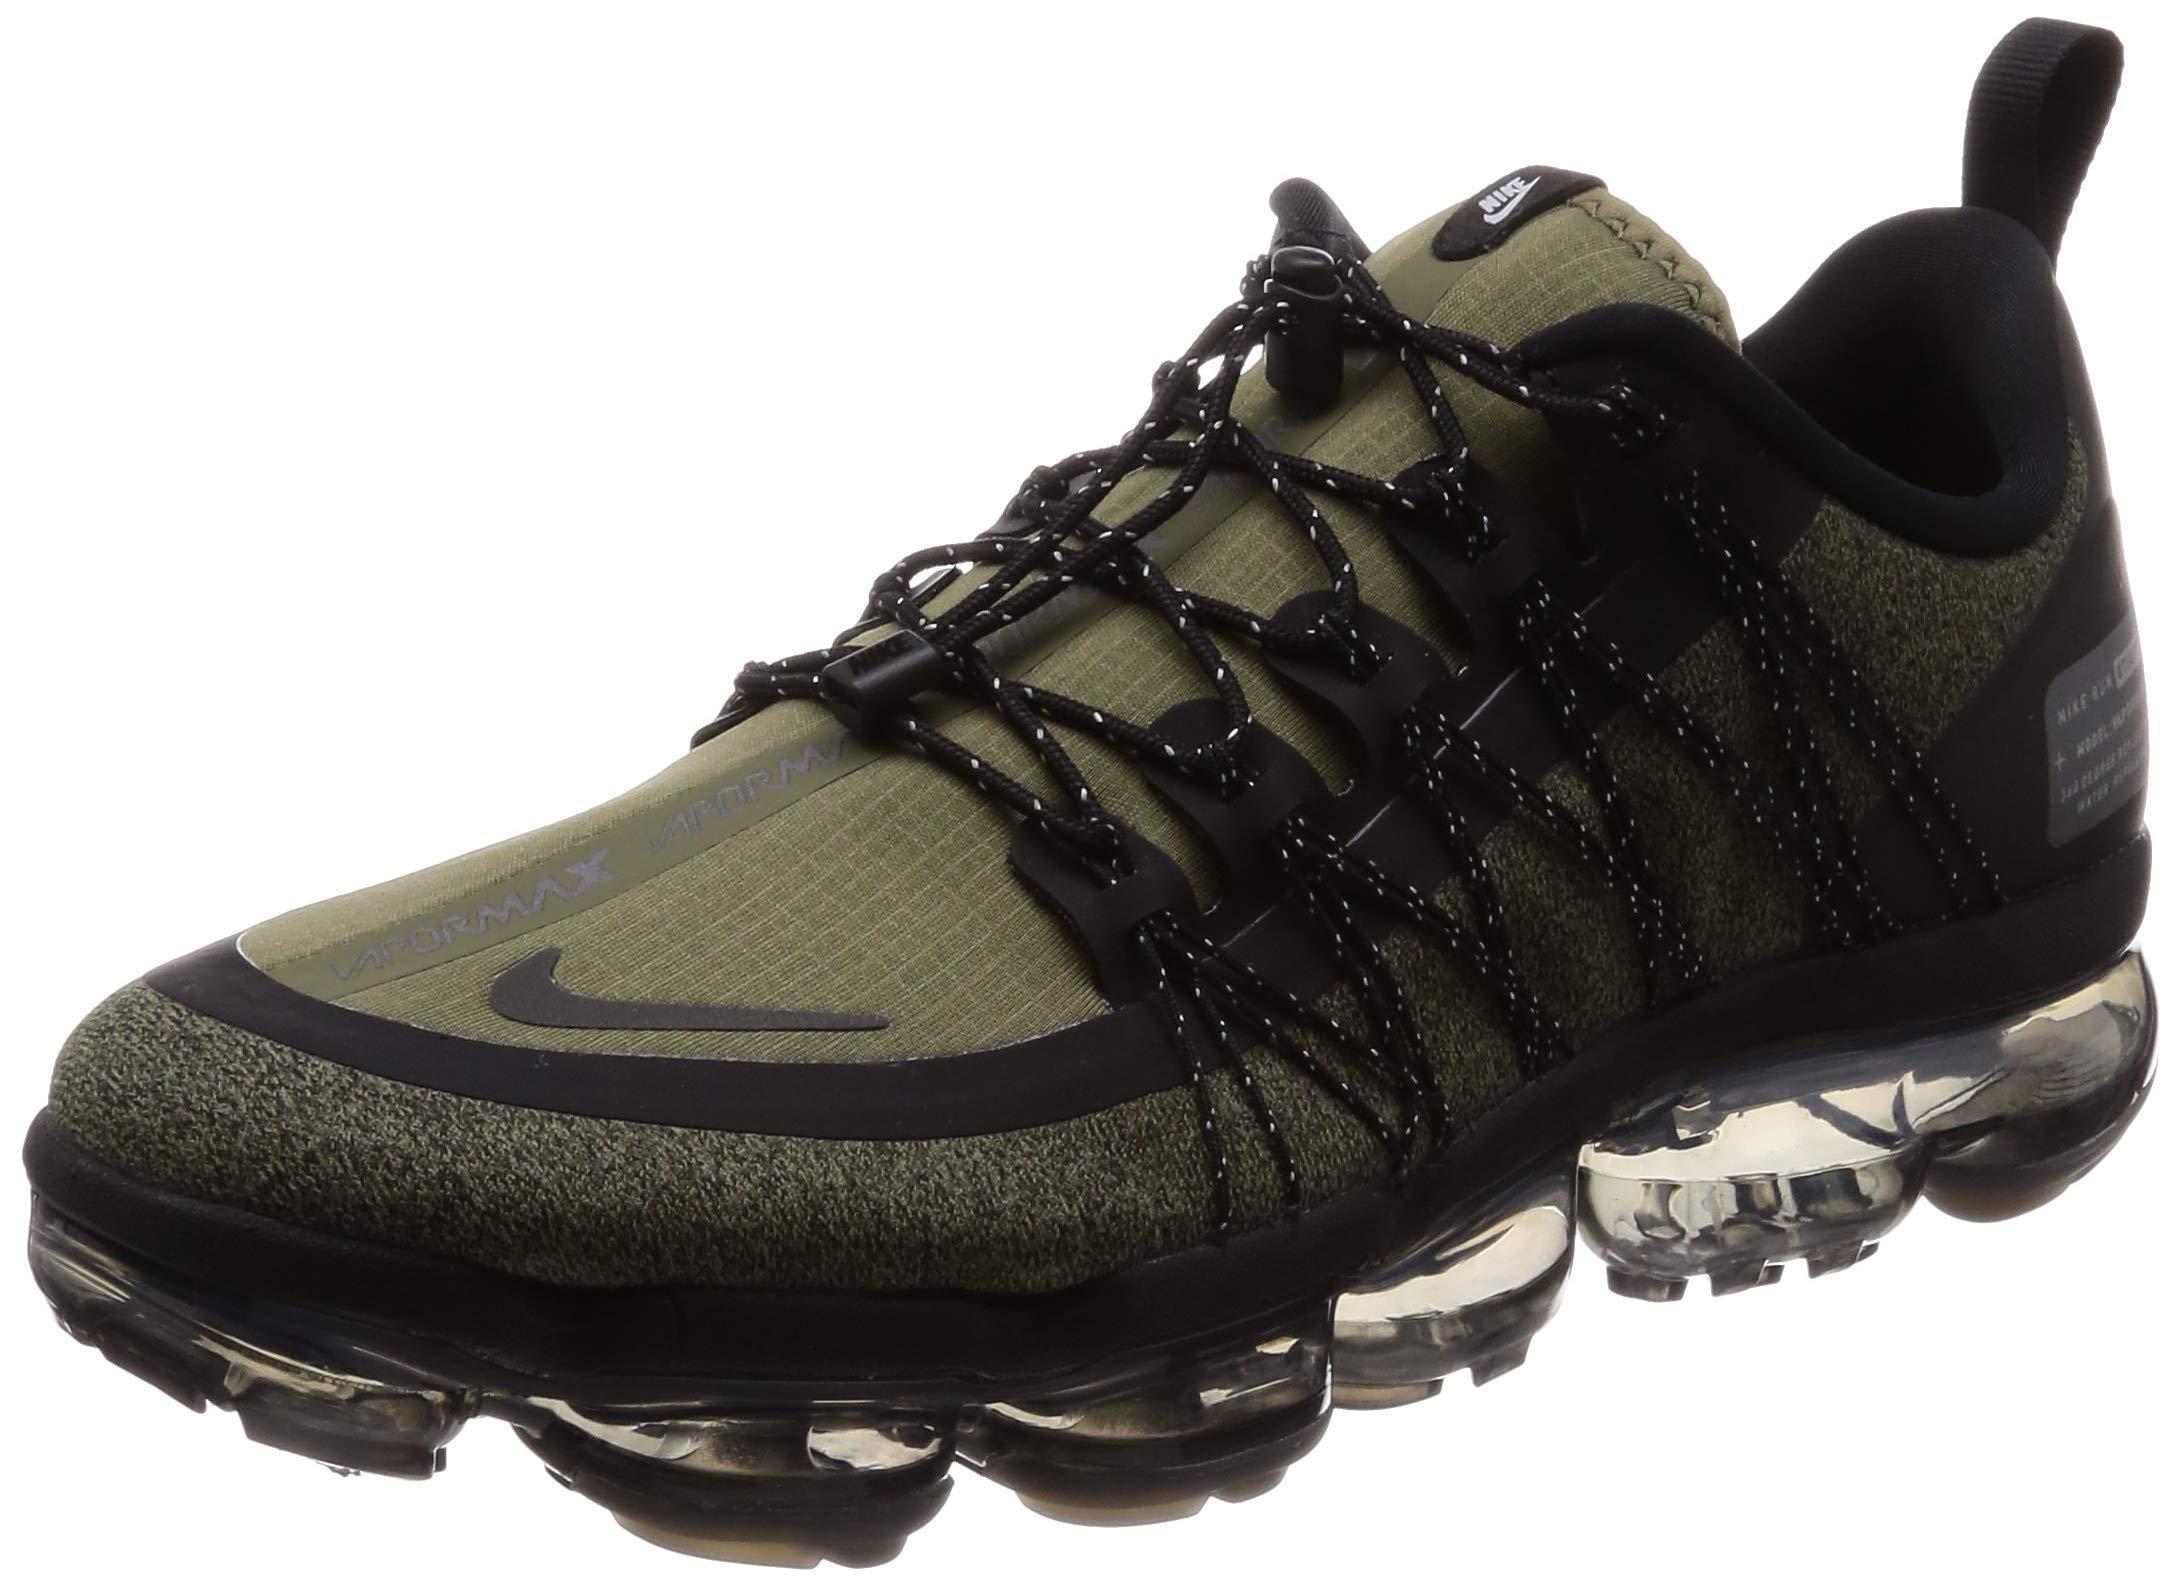 71WK0H3juXL - Nike Men's Air Vapormax Run Utility, Medium Olive/Reflect Silver